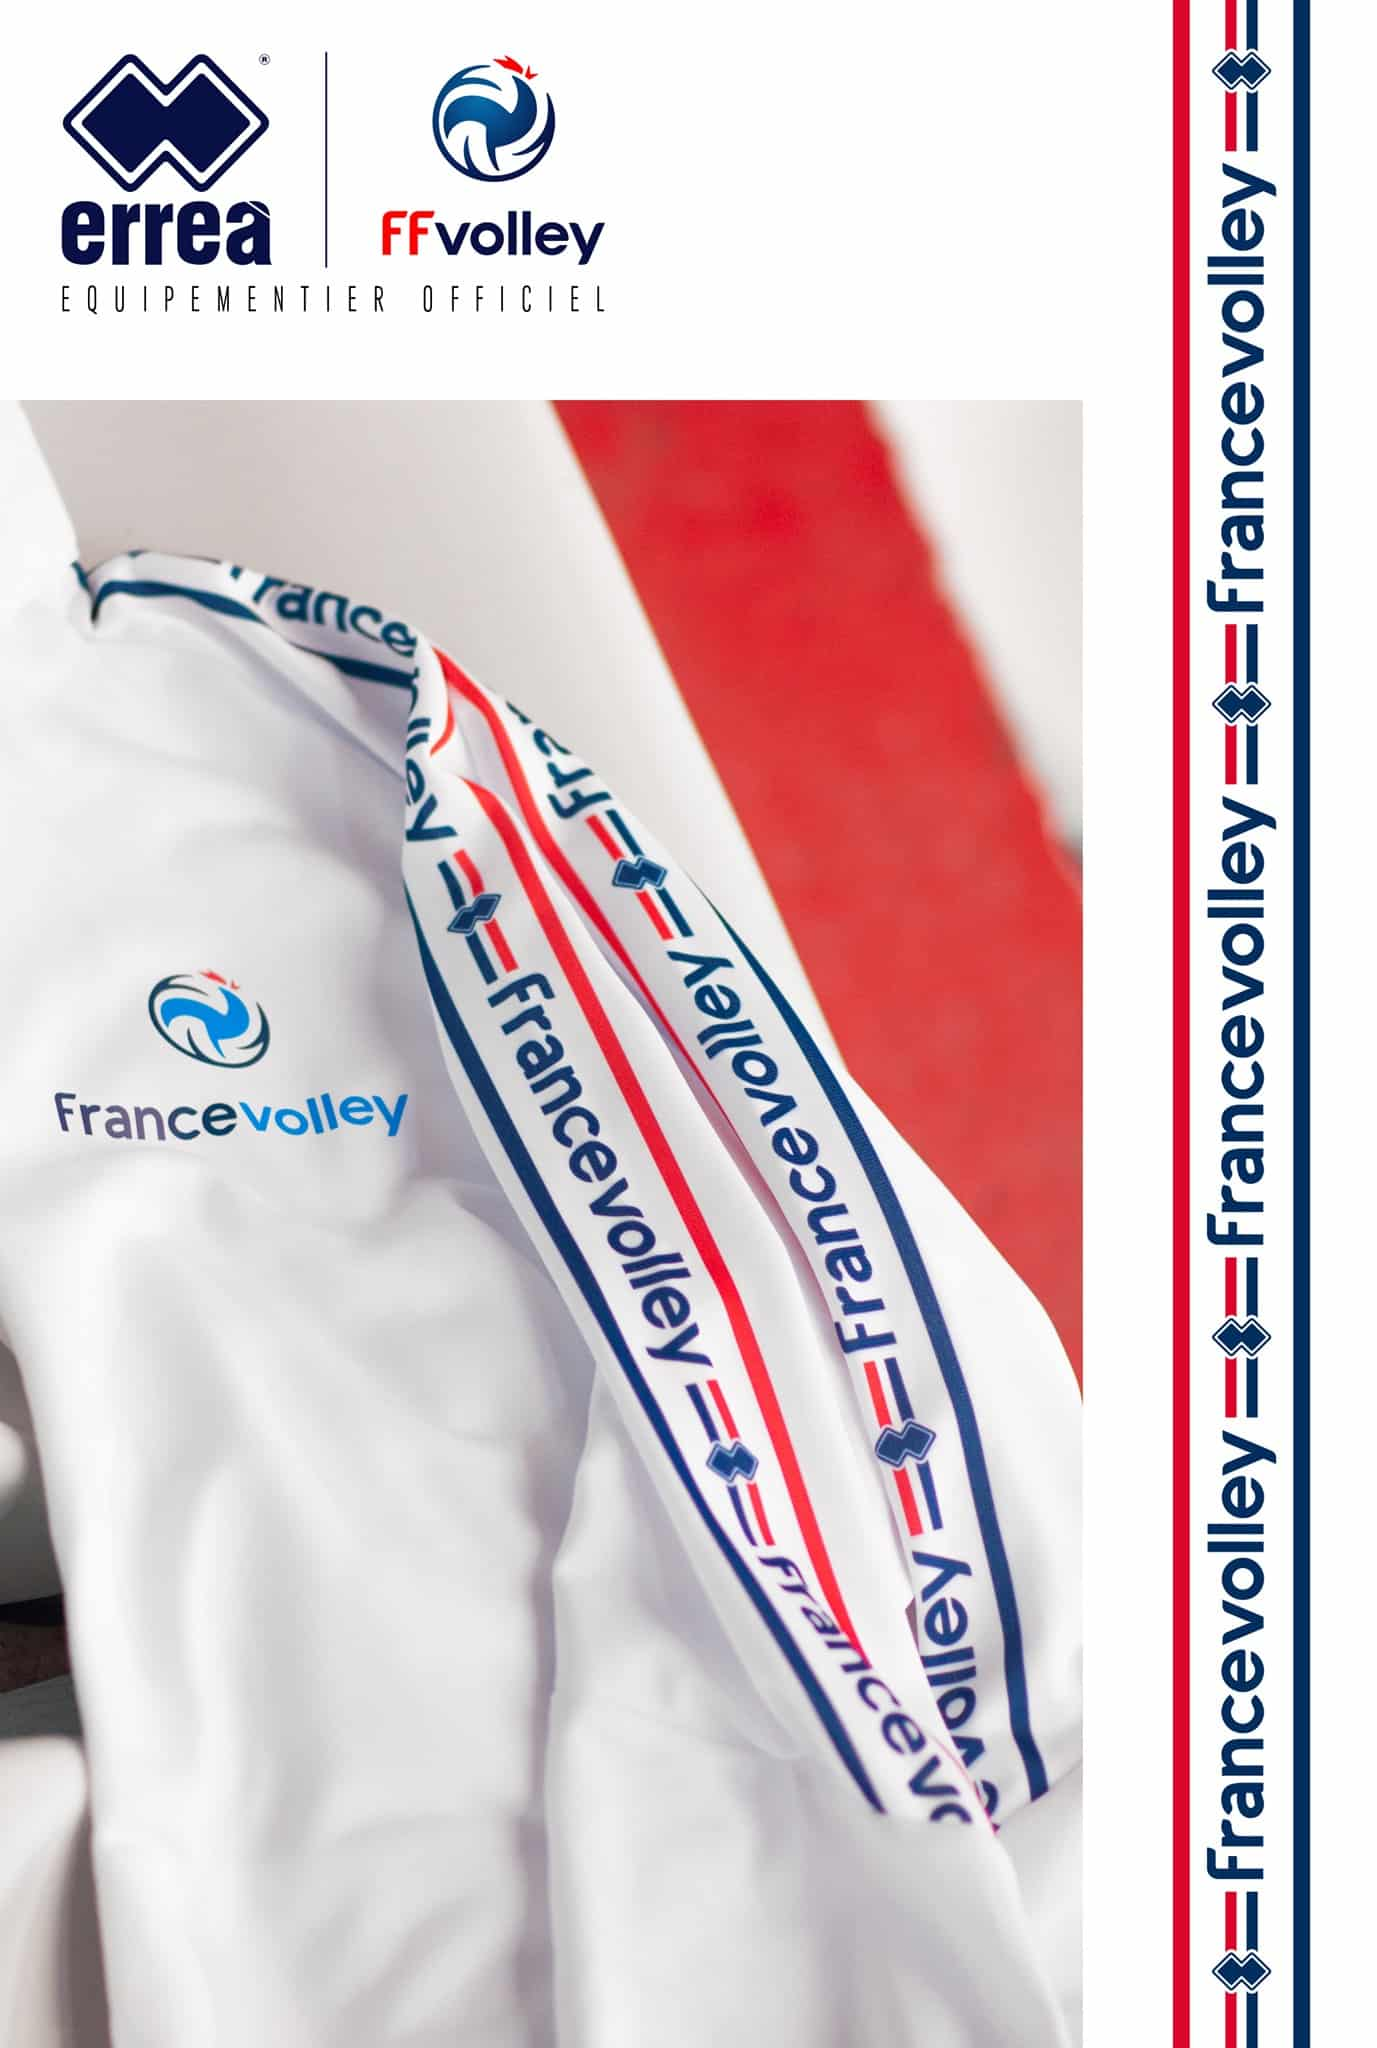 un-nouveau-maillot-errea-de-lequipe-de-france-de-volley-a-venir-4